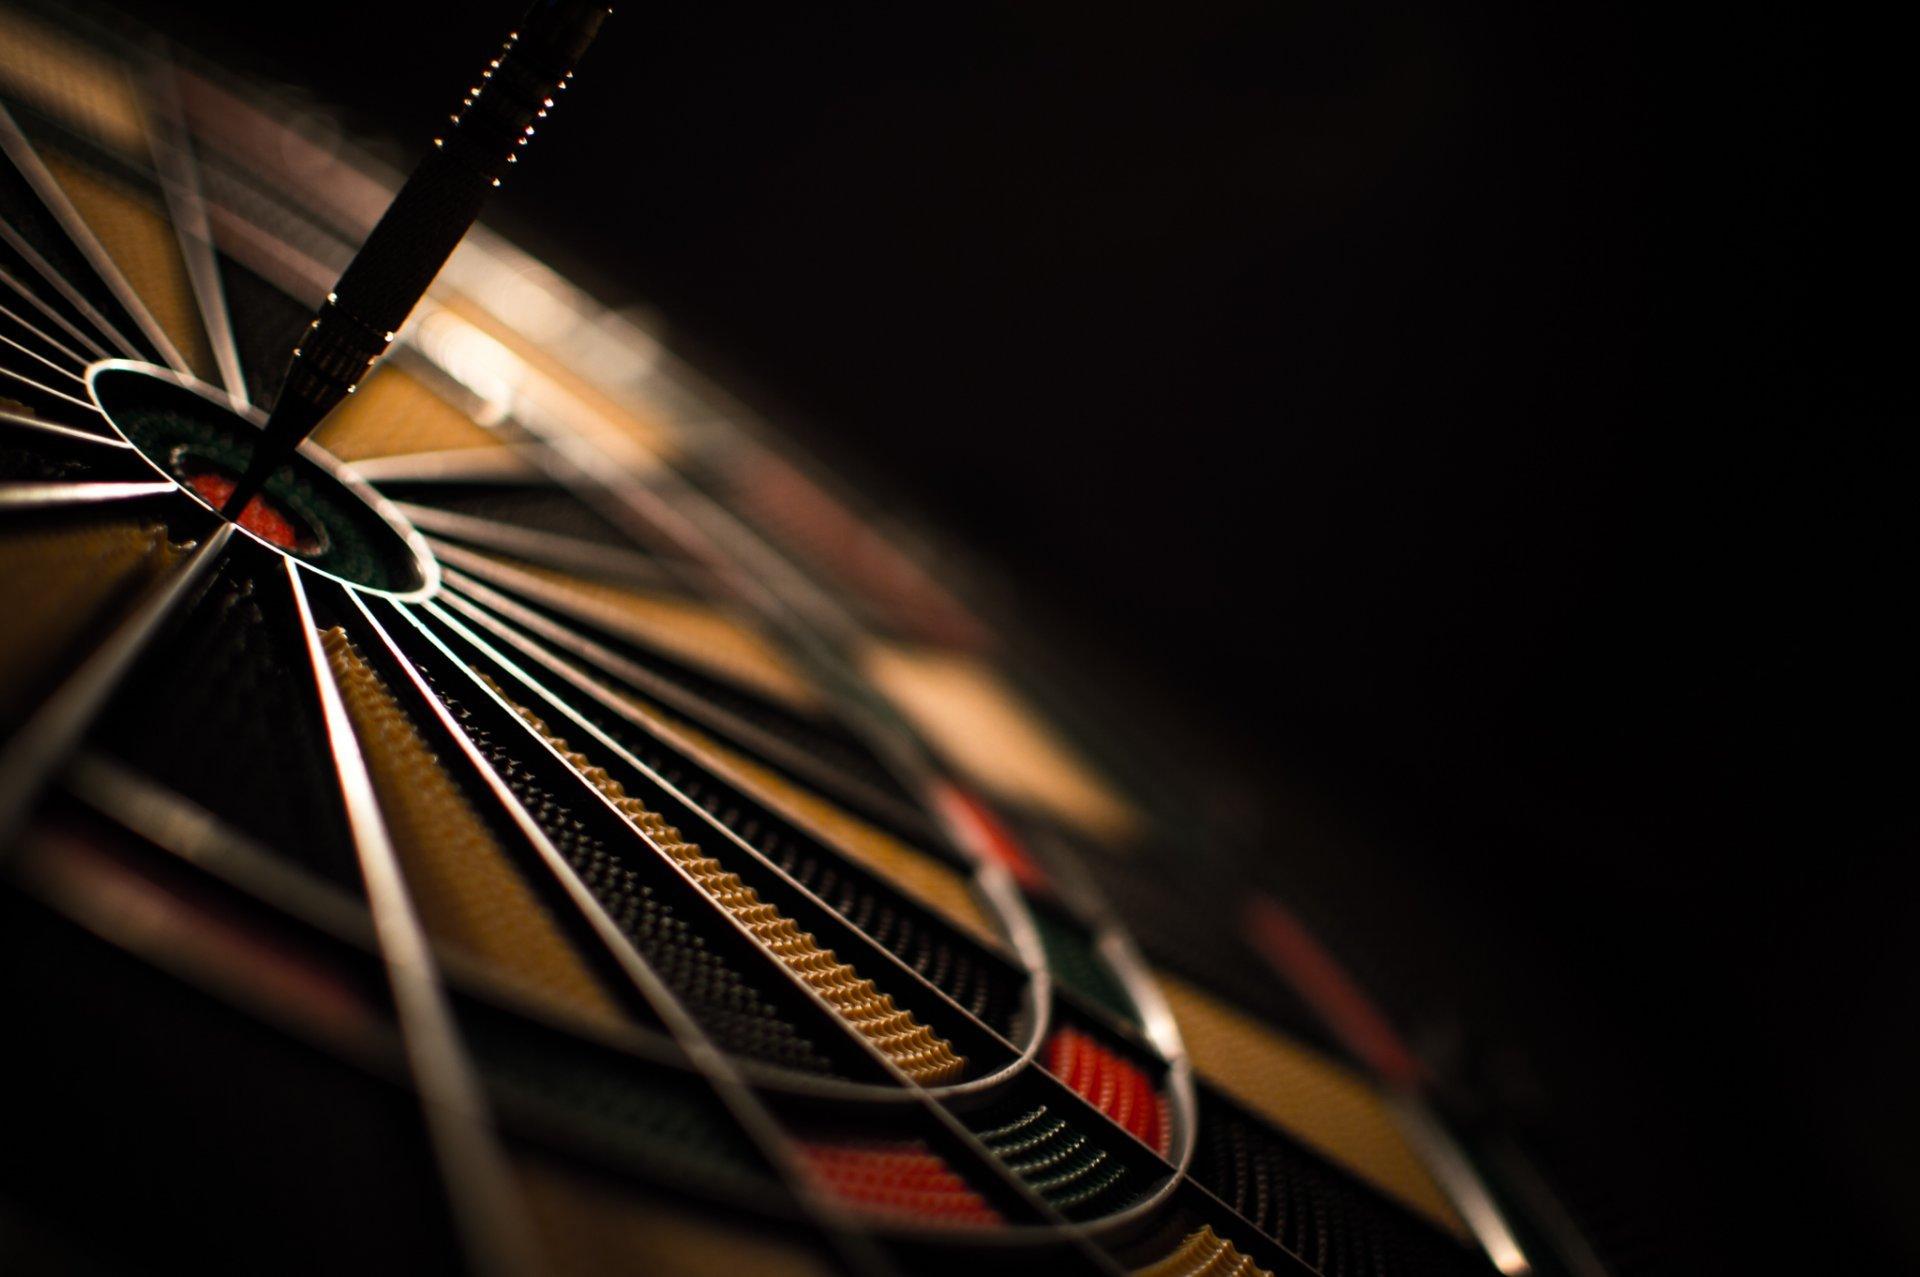 dart board hd wallpapers - photo #4